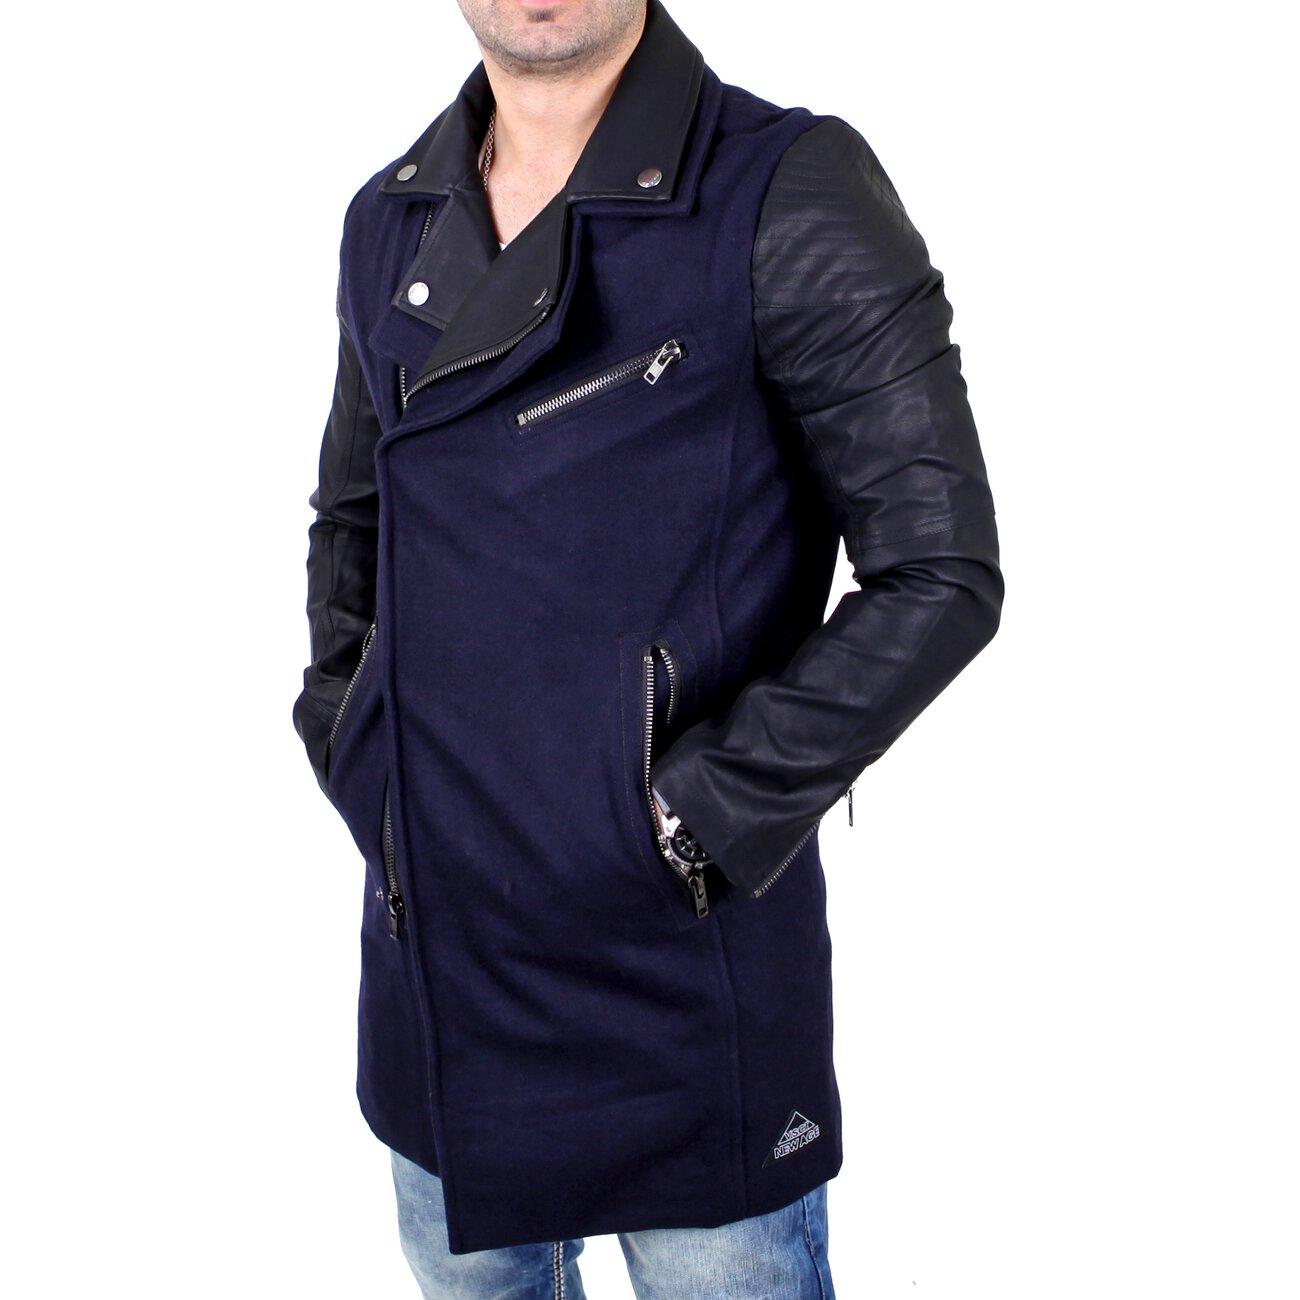 VSCT Jacke Herren Customized Biker Woalcoat Mantel V-5800344 Navy XL.  178,98 €  . sofort verfügbar. zum Artikel · Urban Classics Mantel Herren  Gabardine ... 62e0546154